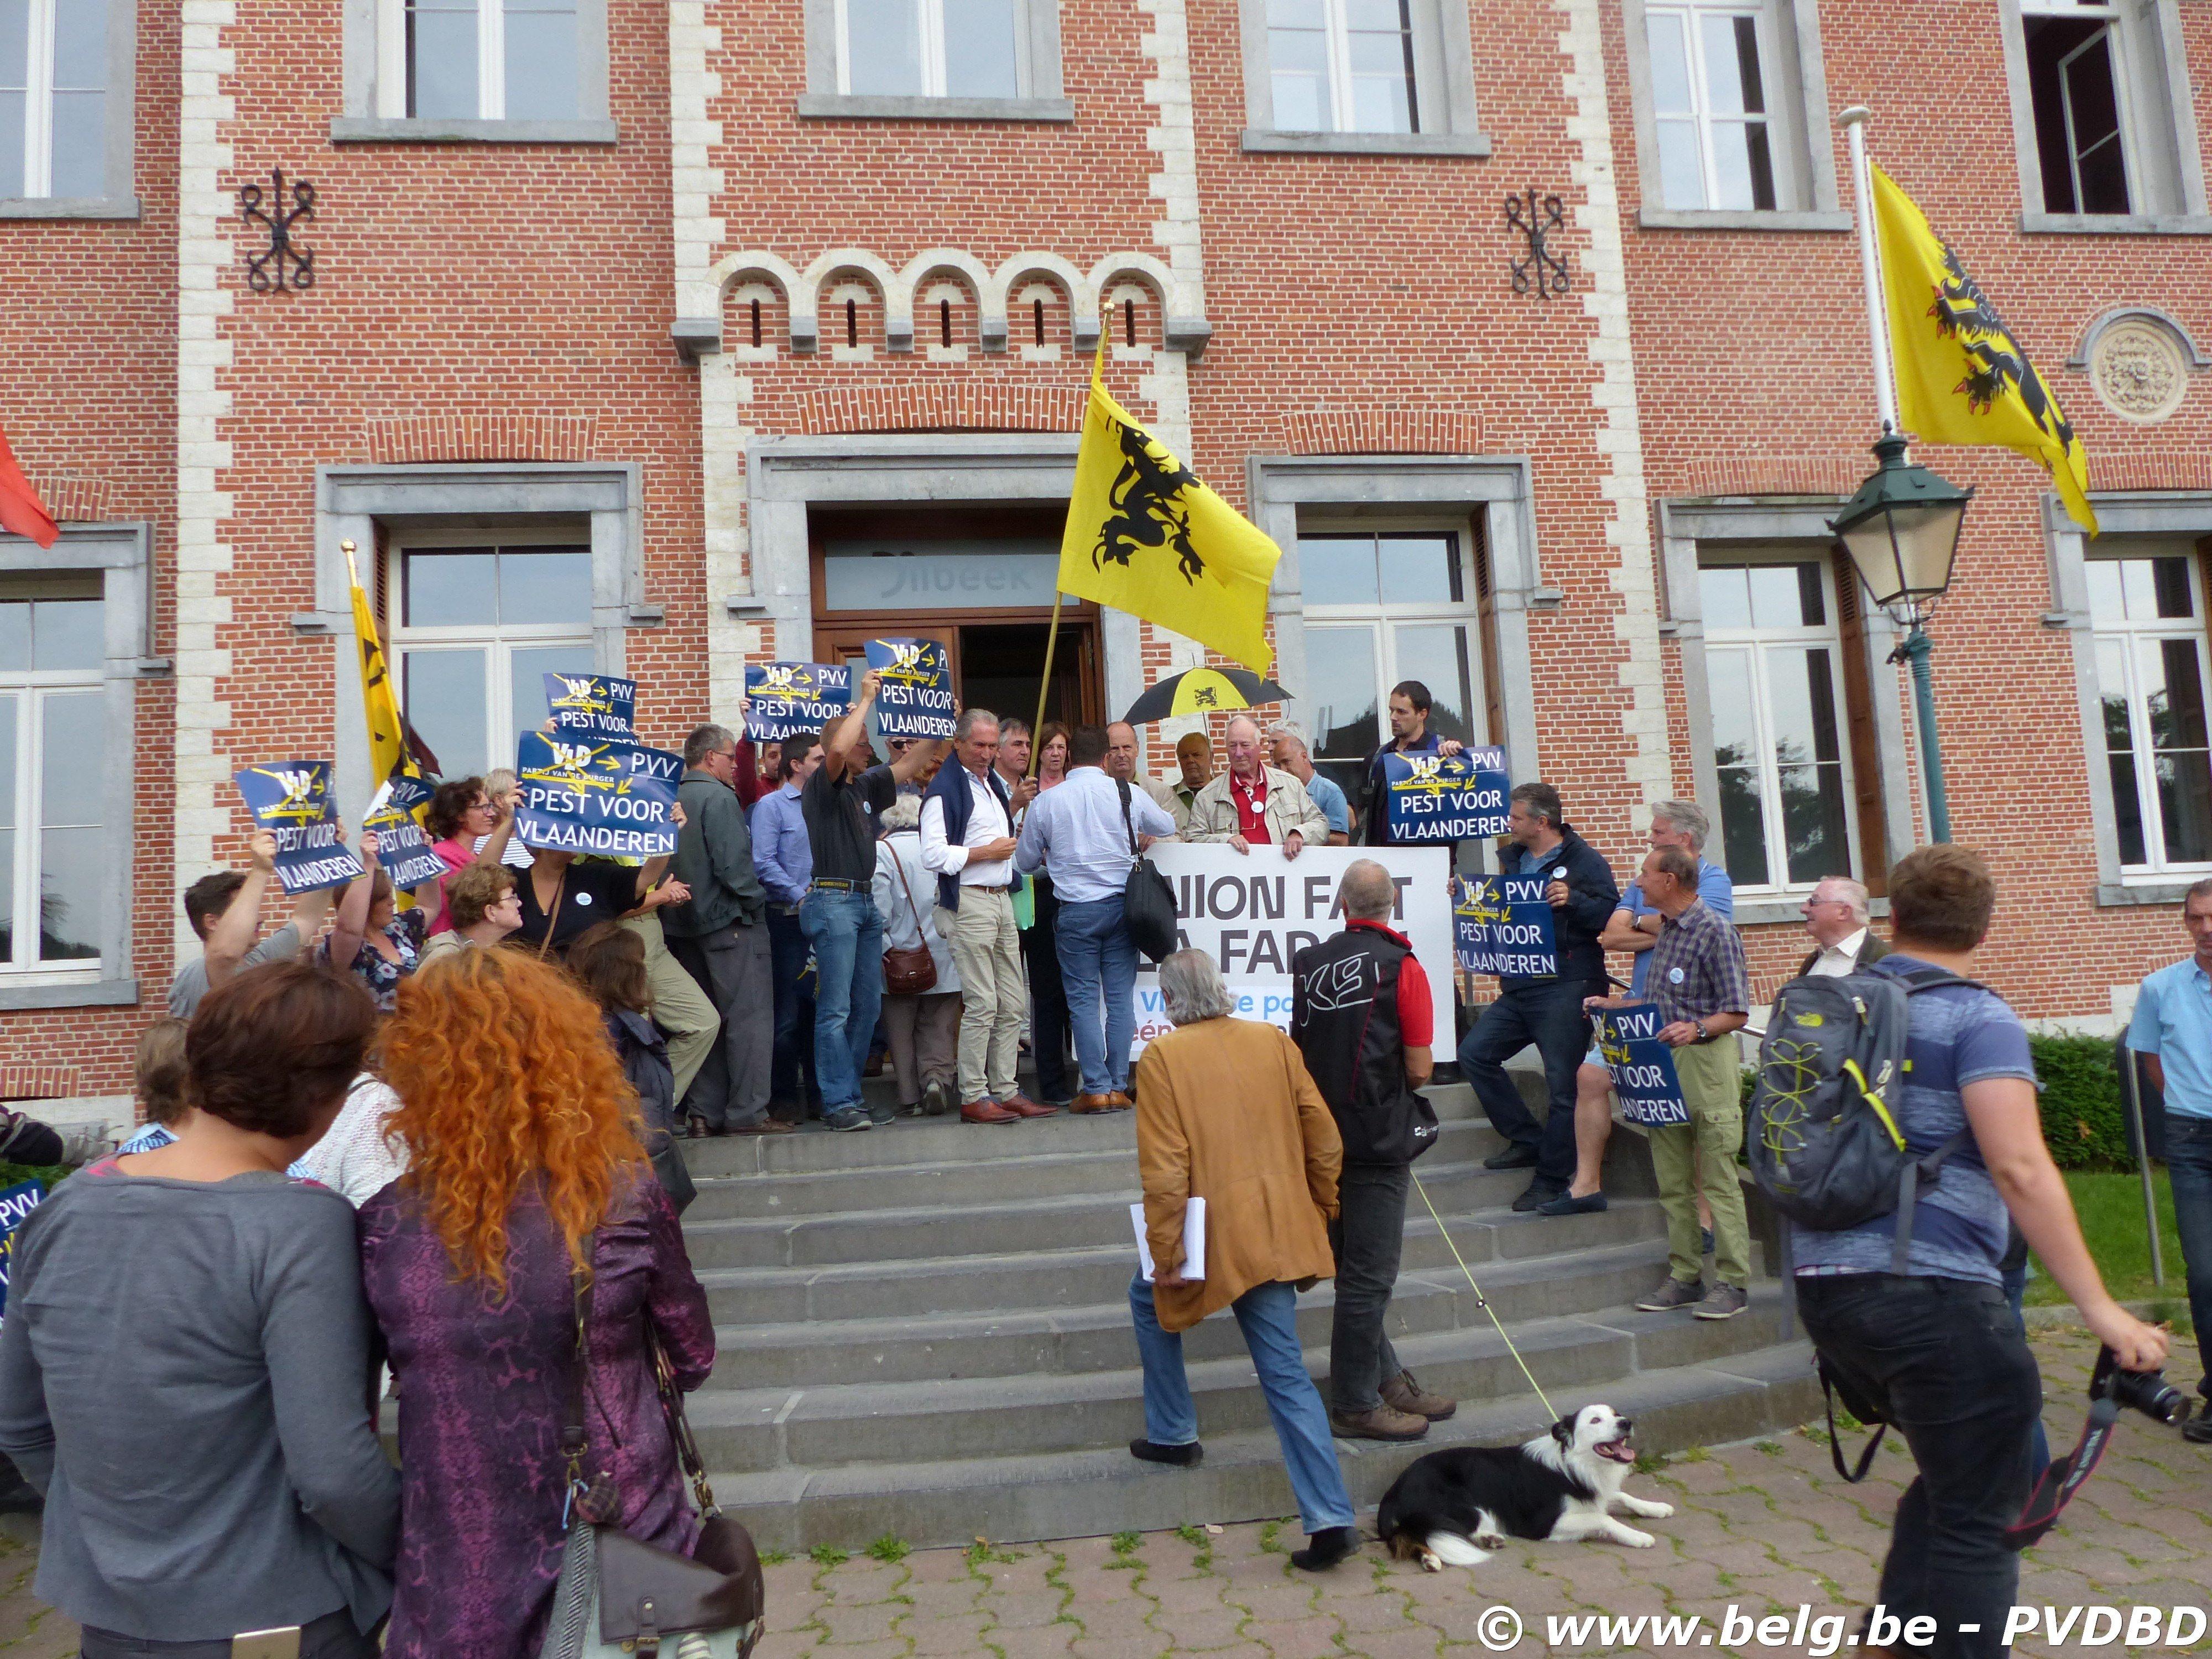 Luid protest op trappen Dilbeeks gemeentehuis - P1090851